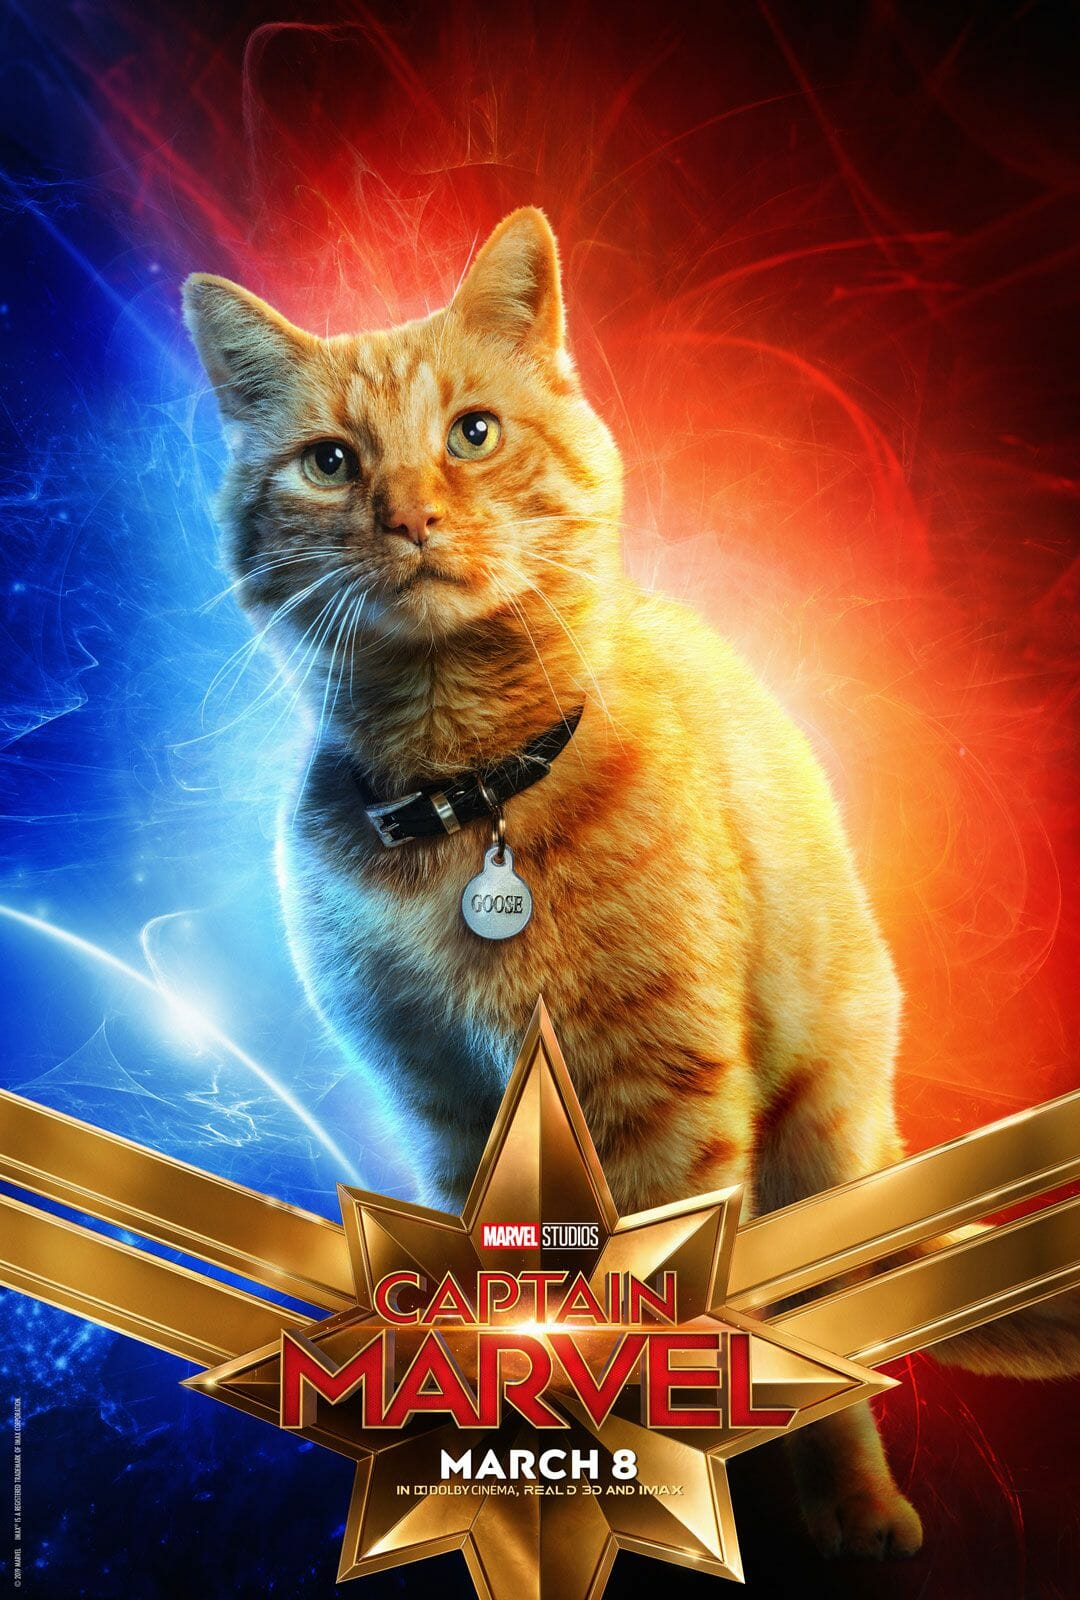 Captain Marvel's Cat Has a Bizarre Comic Book Origin Story